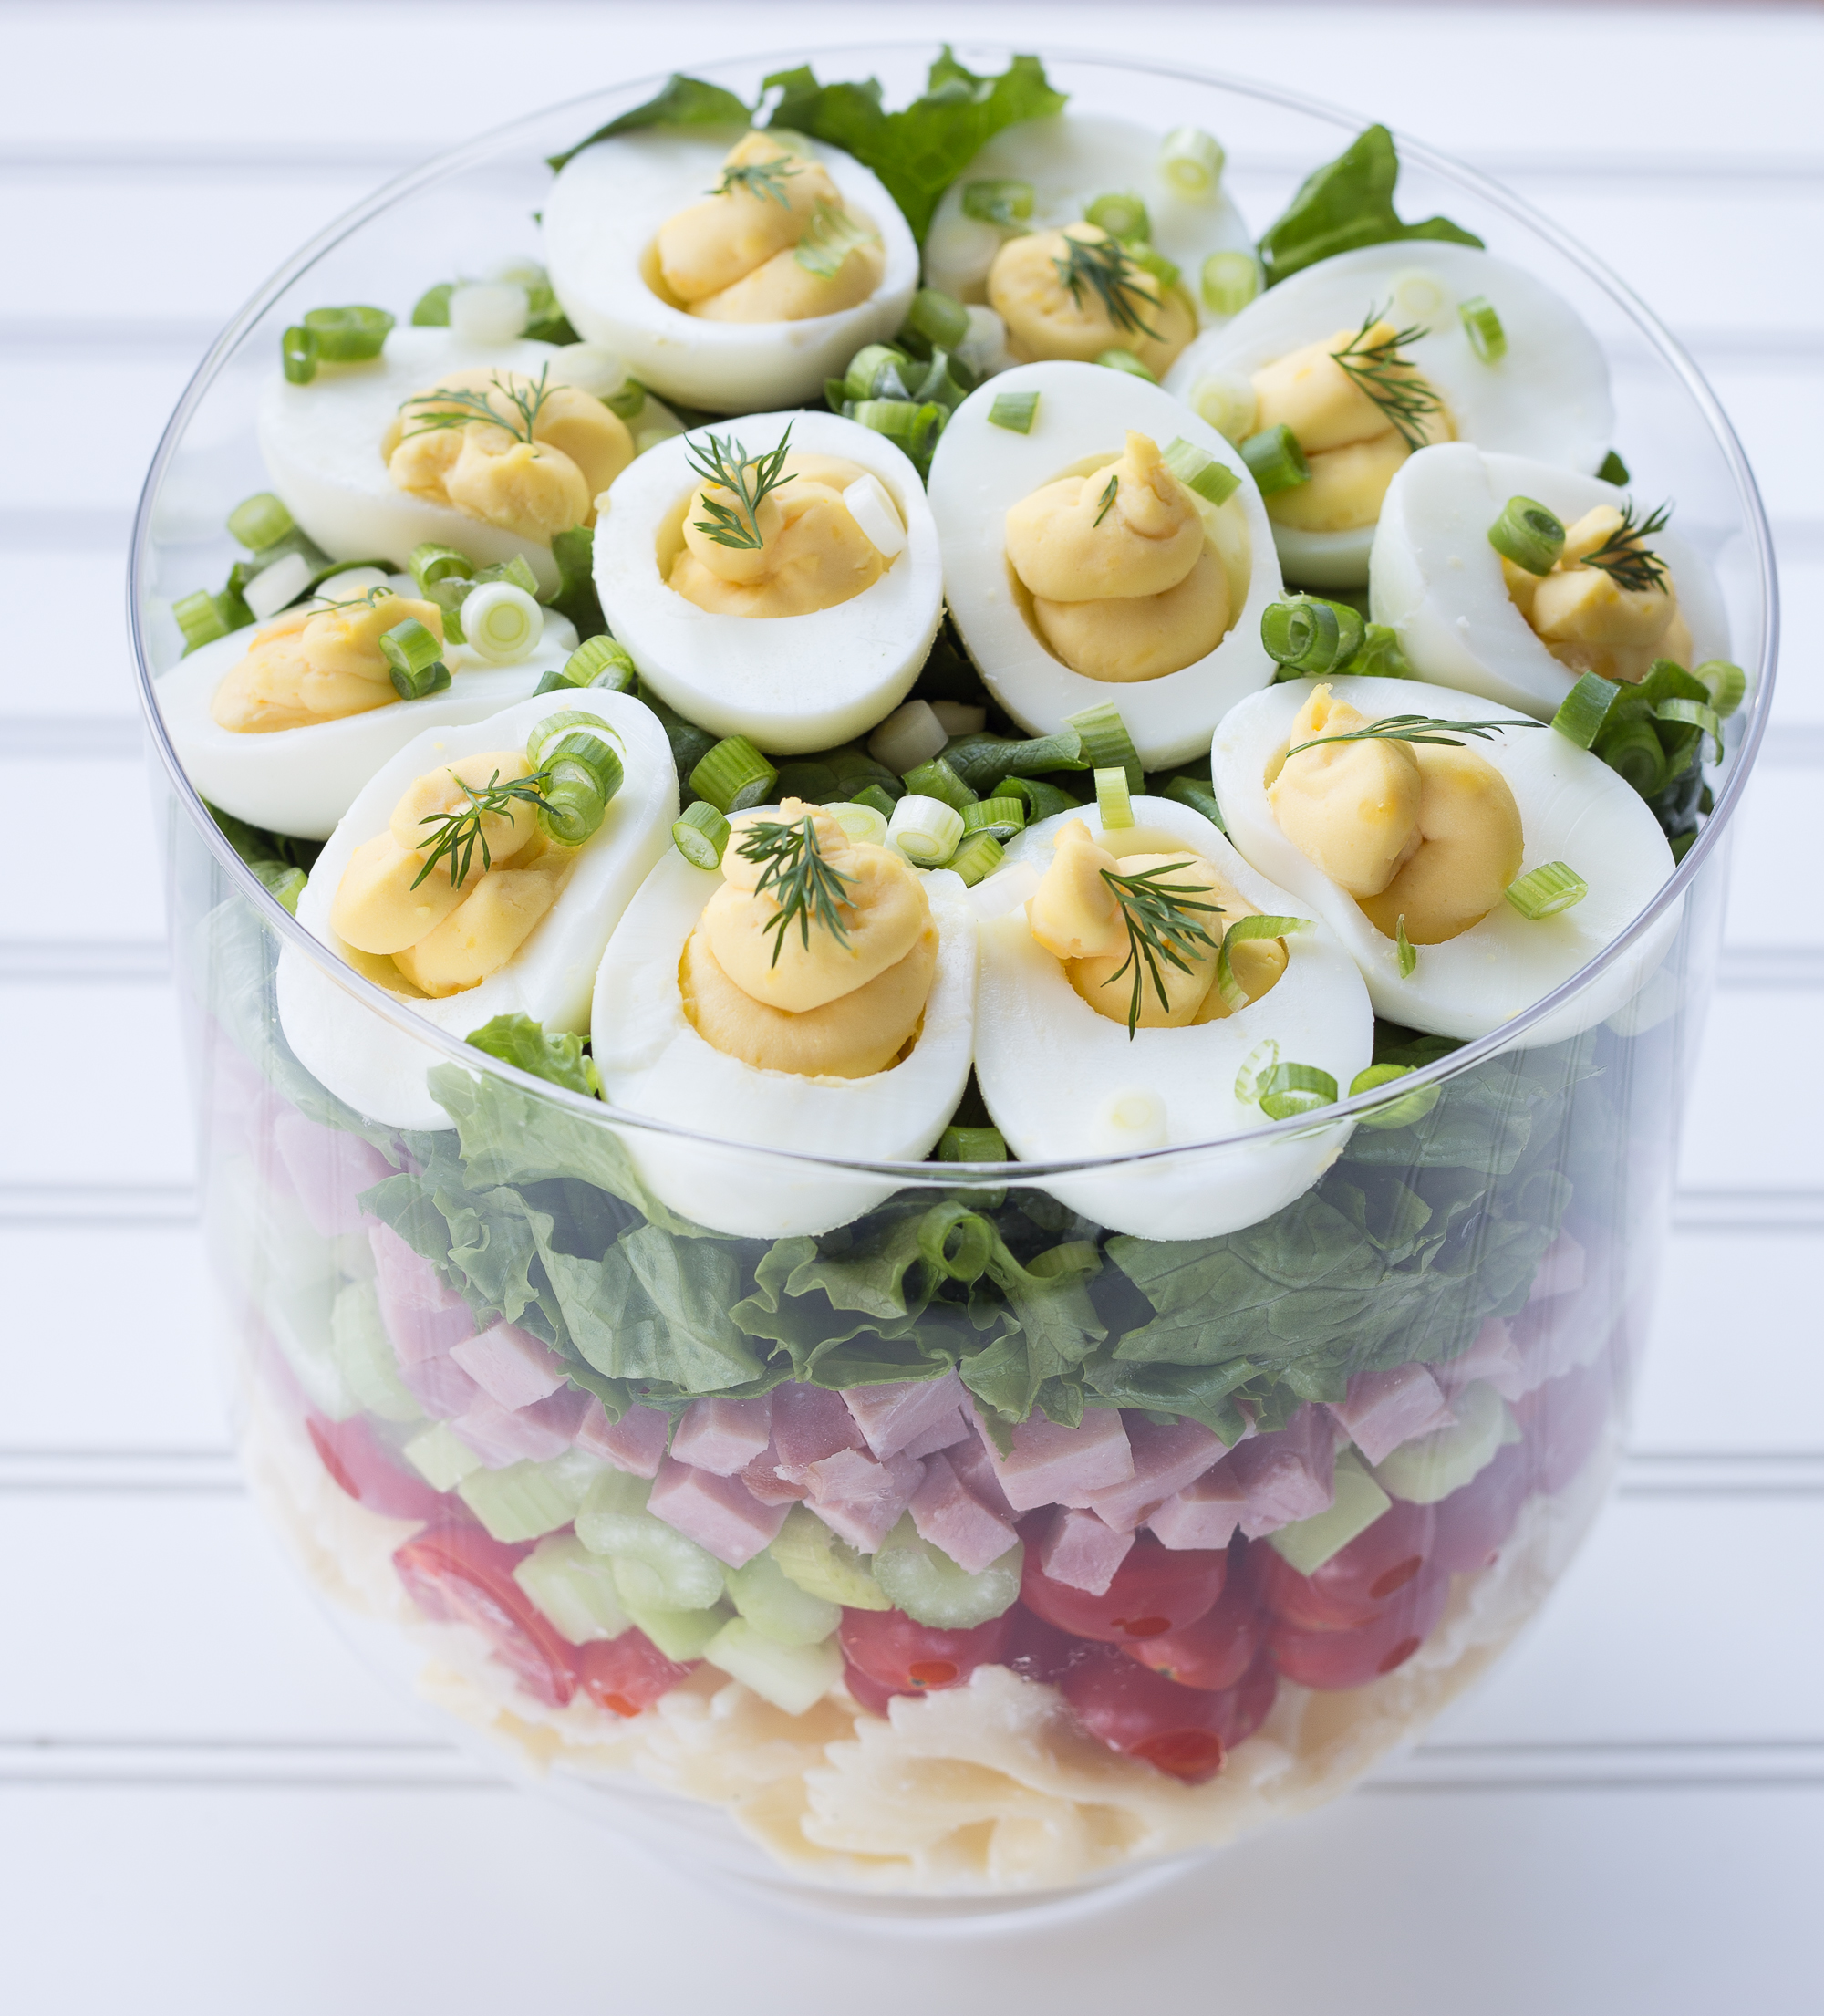 Layered Deviled Egg Pasta Salad